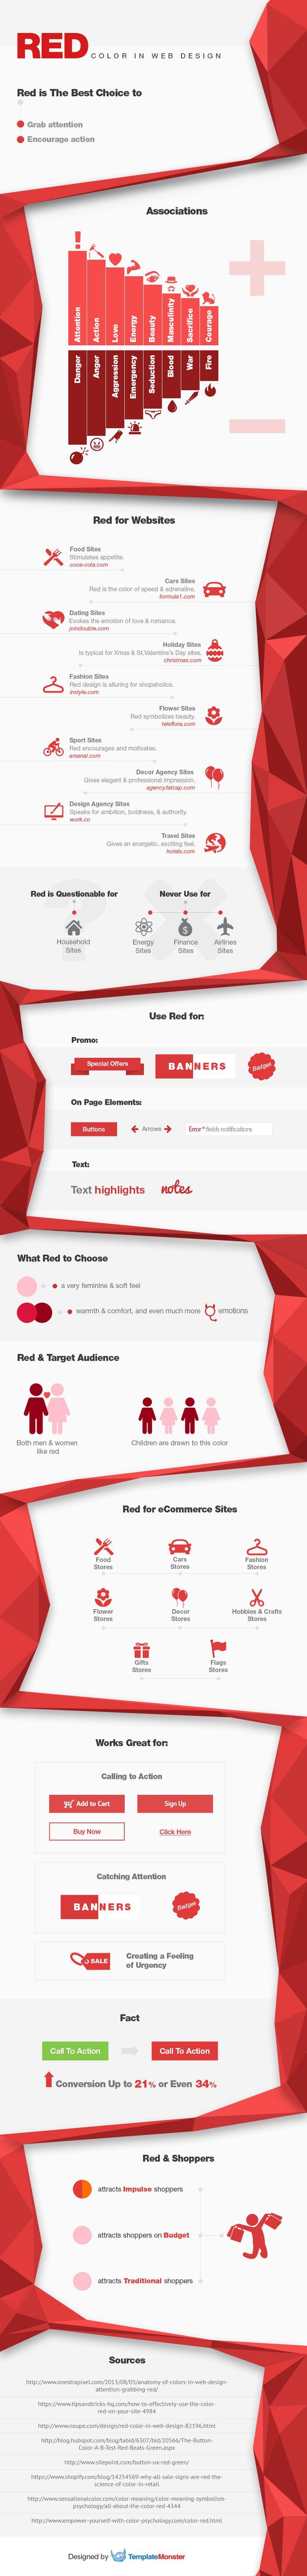 Take a Look at Red Color in Web Design Infographics http://blog.templatemonster.com/2015/11/05/red-color-web-design-infographics/?utm_source=pinterest&utm_medium=timeline&utm_campaign=redinf